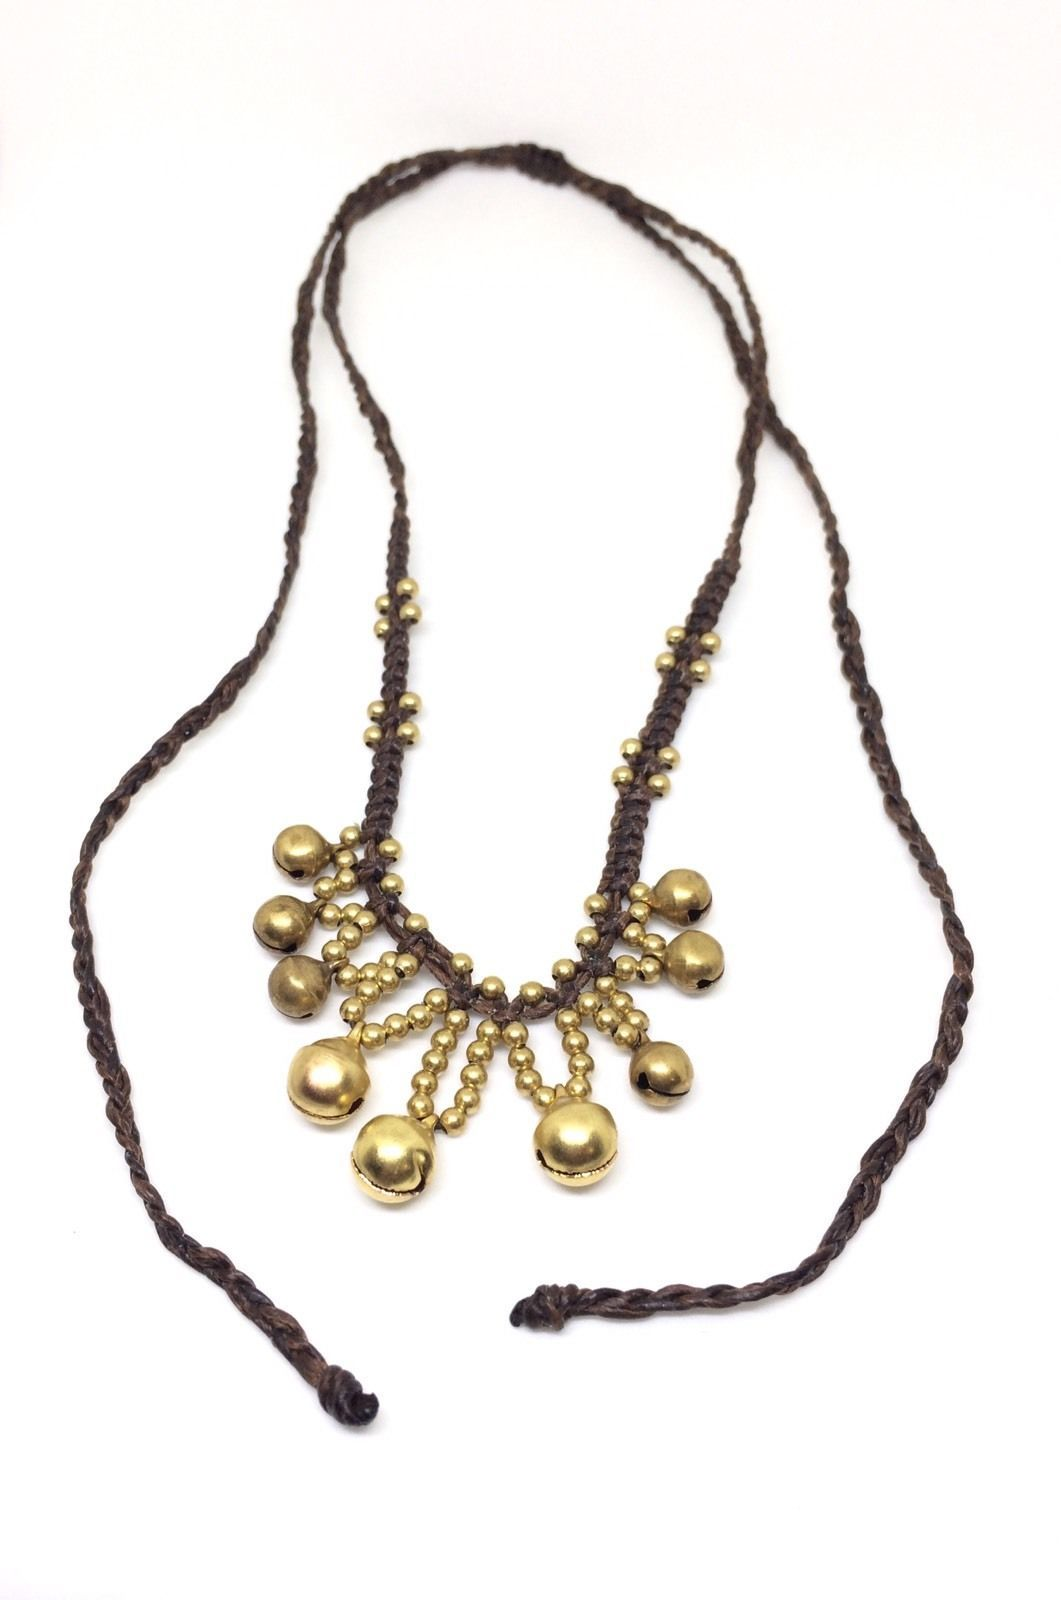 Brass Jingle Bell Bead Wax Cotton Pendant Choker Summer NECKLACE Asian Jewelry